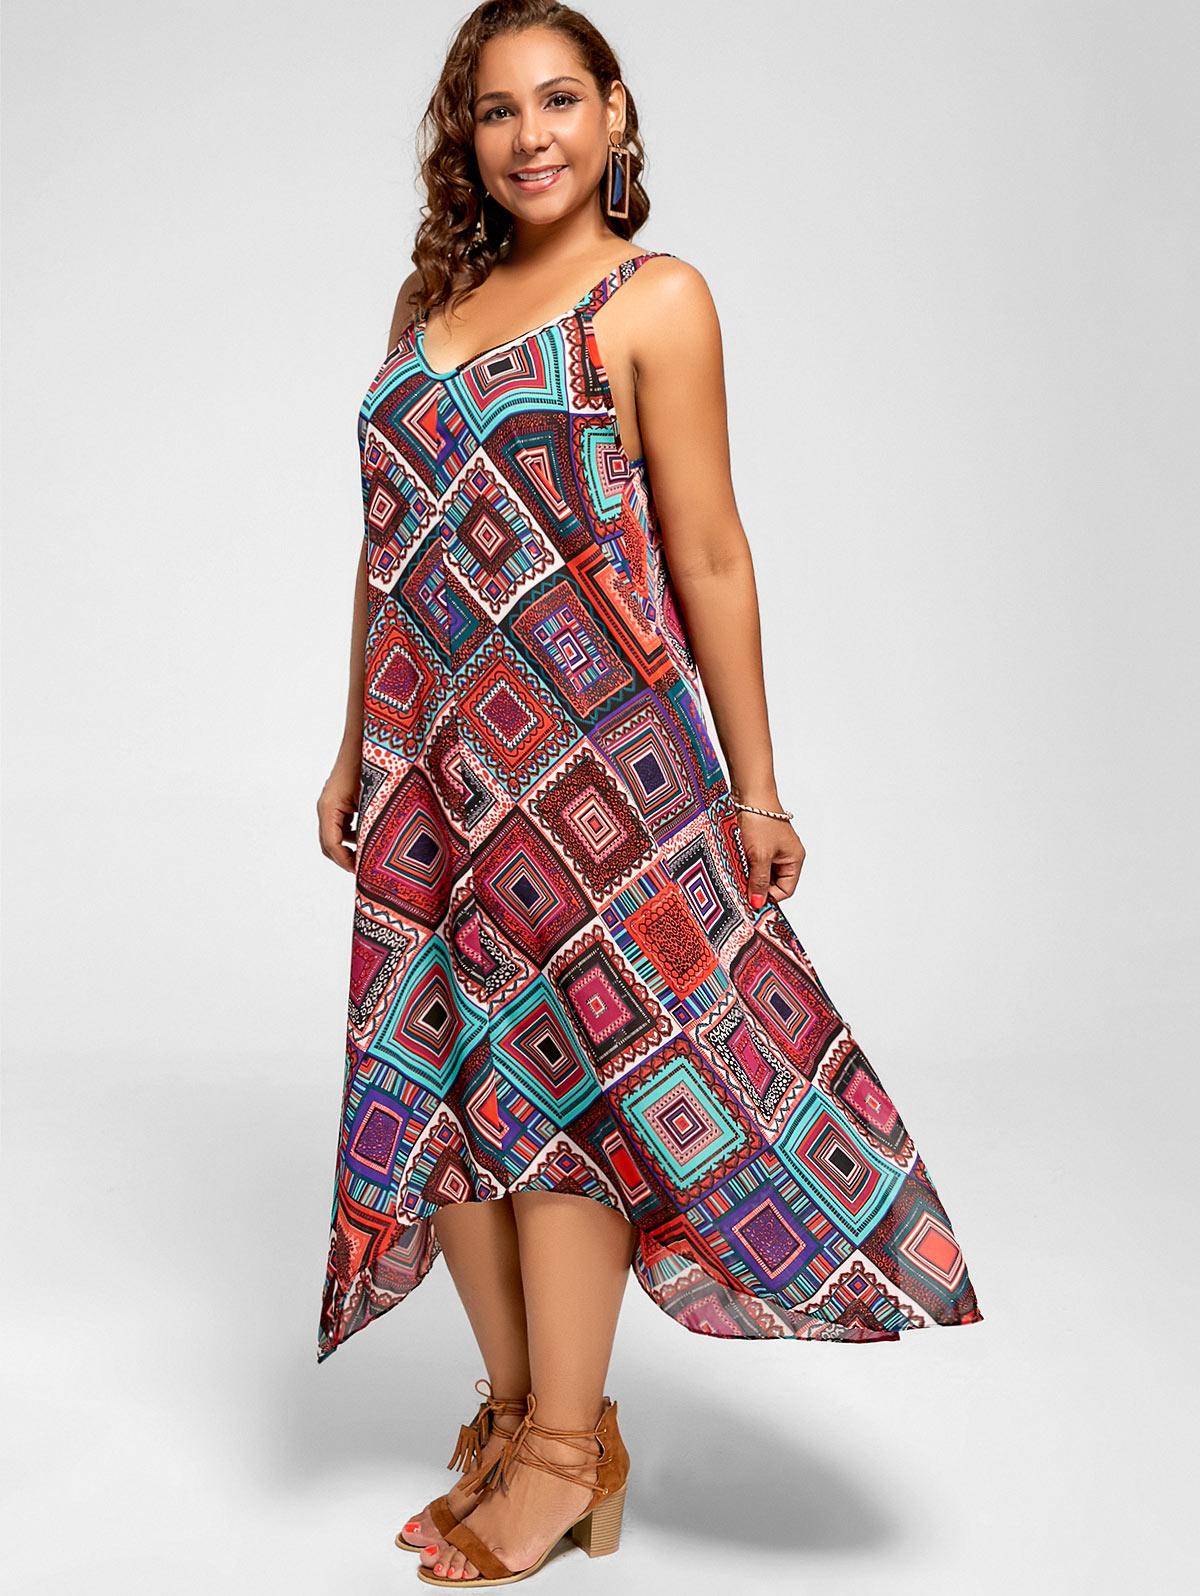 US $15.5 22% OFF|Wipalo Women Plus Size Striped Handkerchief Dress Female  Summer Spaghetti Strap Sleeveless Asymmetrical Dresses Vestidos-in Dresses  ...